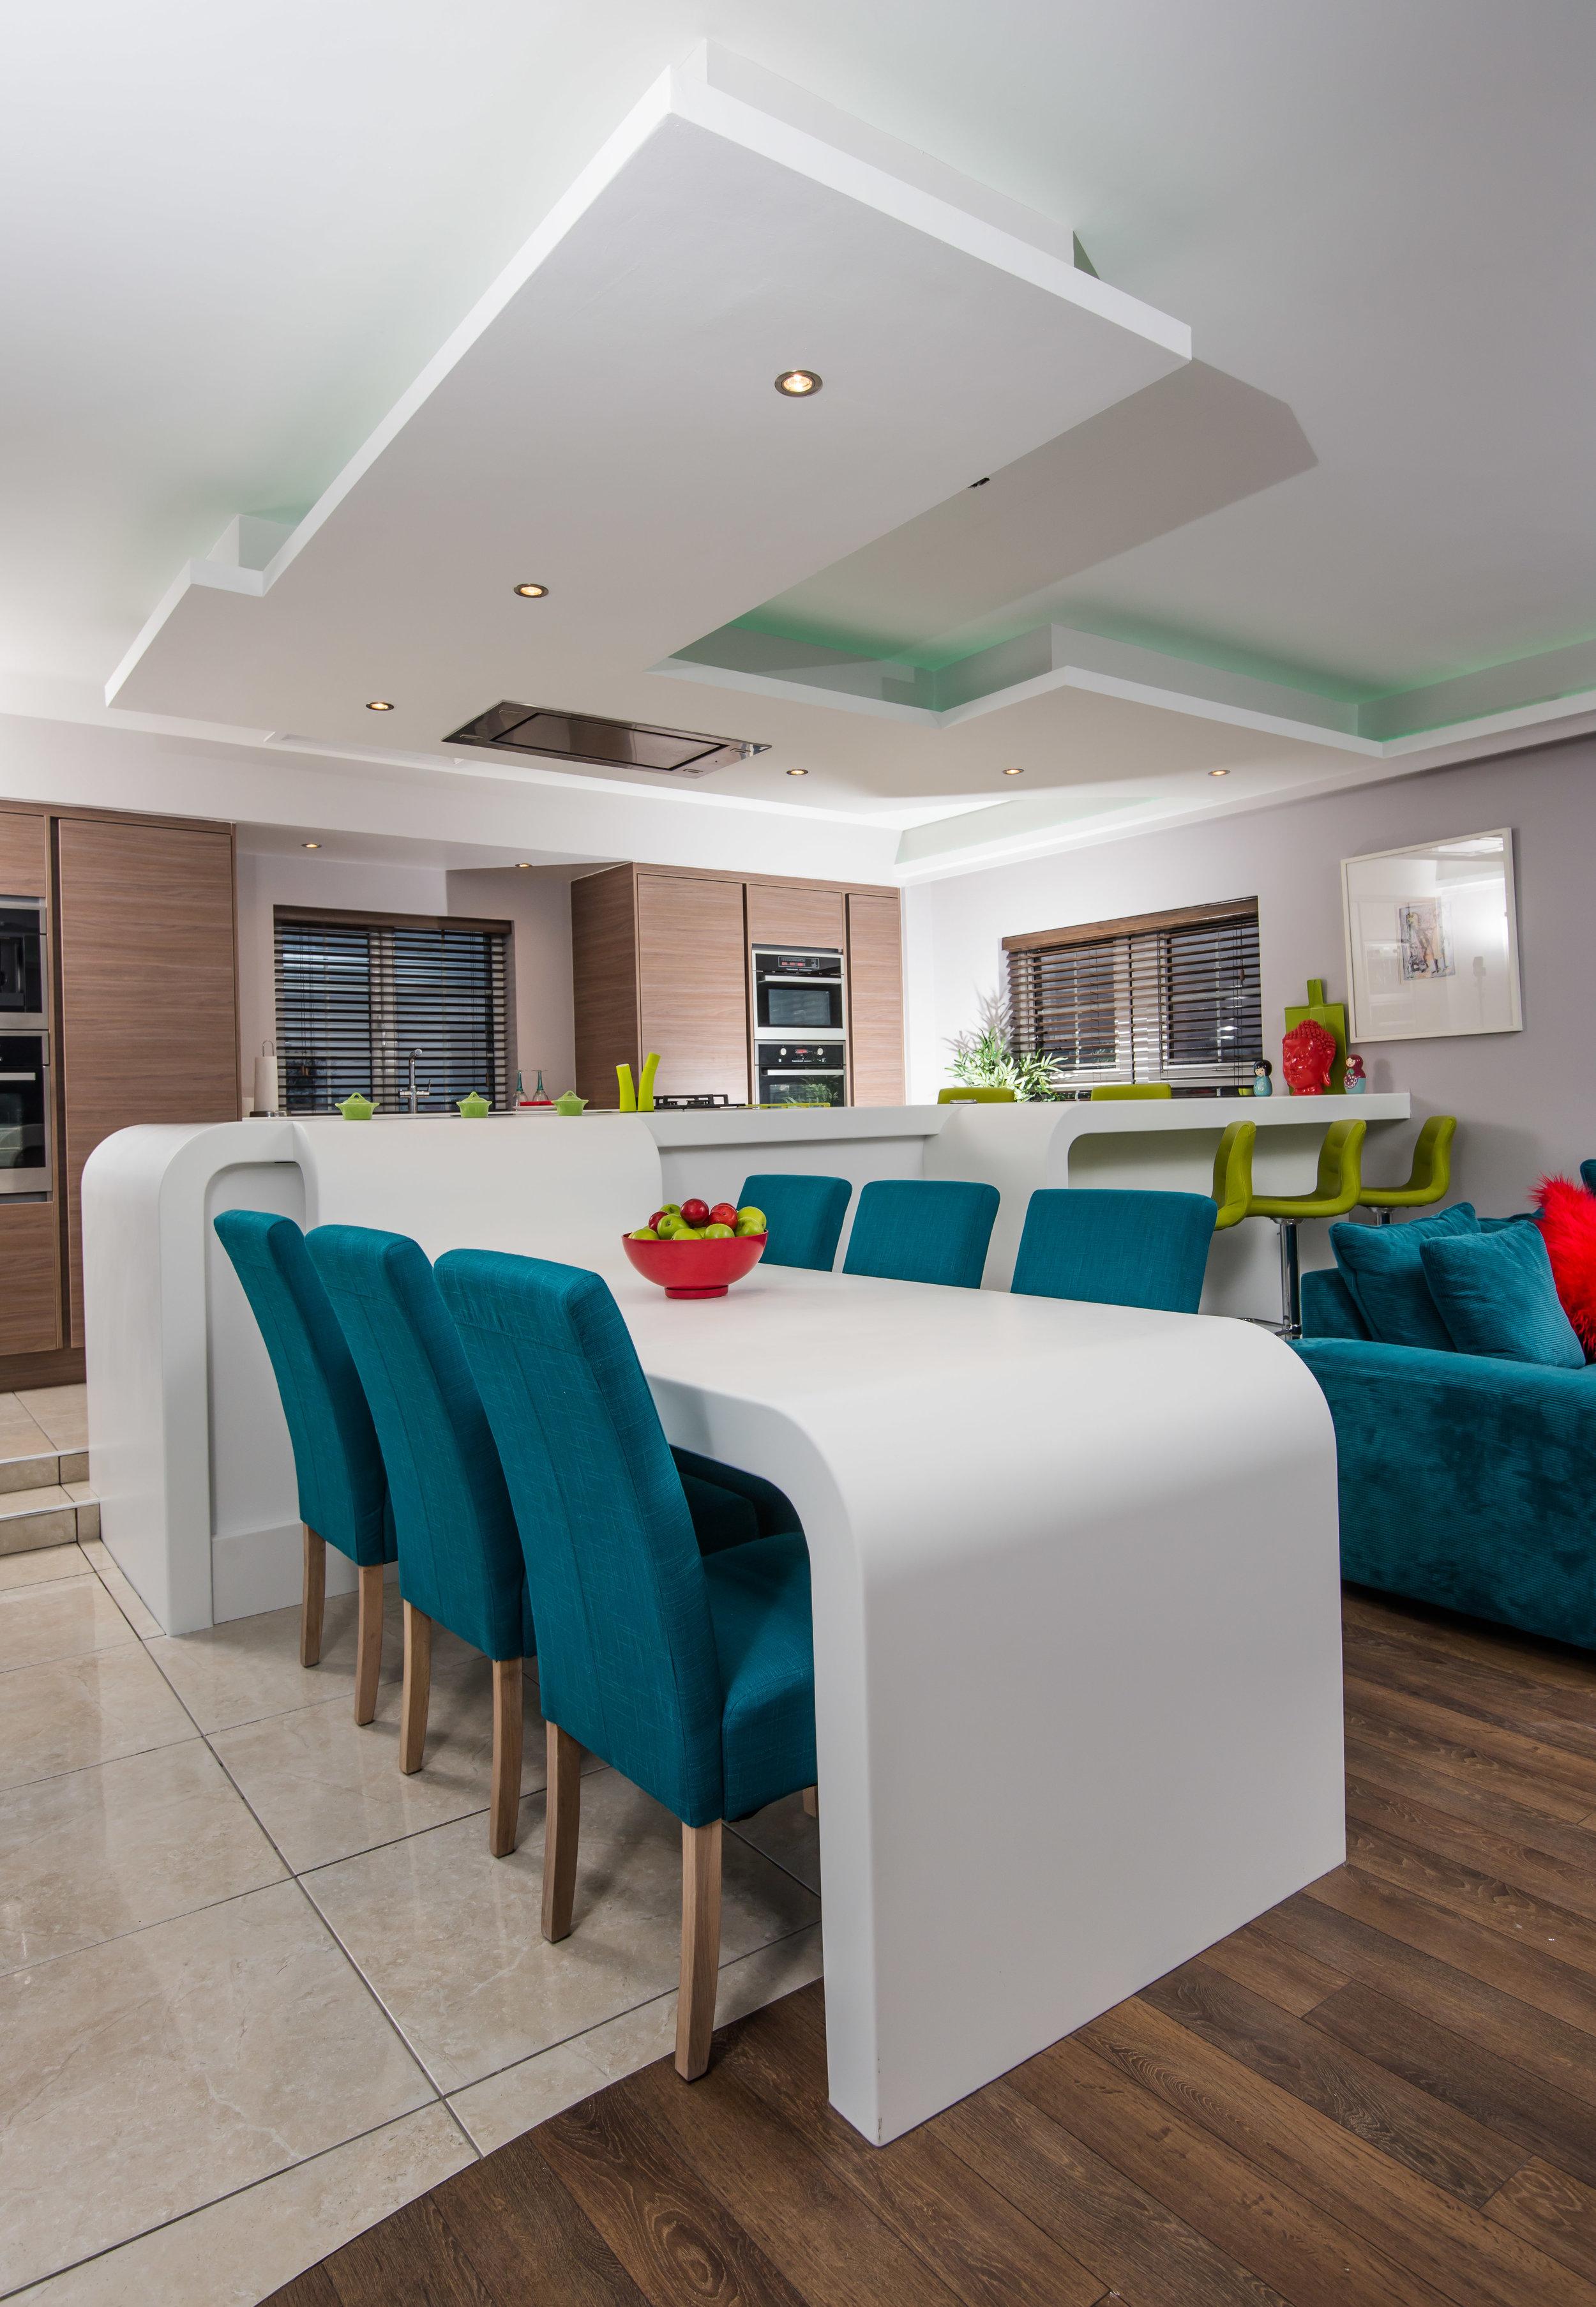 PH -007 -Corian kitchen.JPG